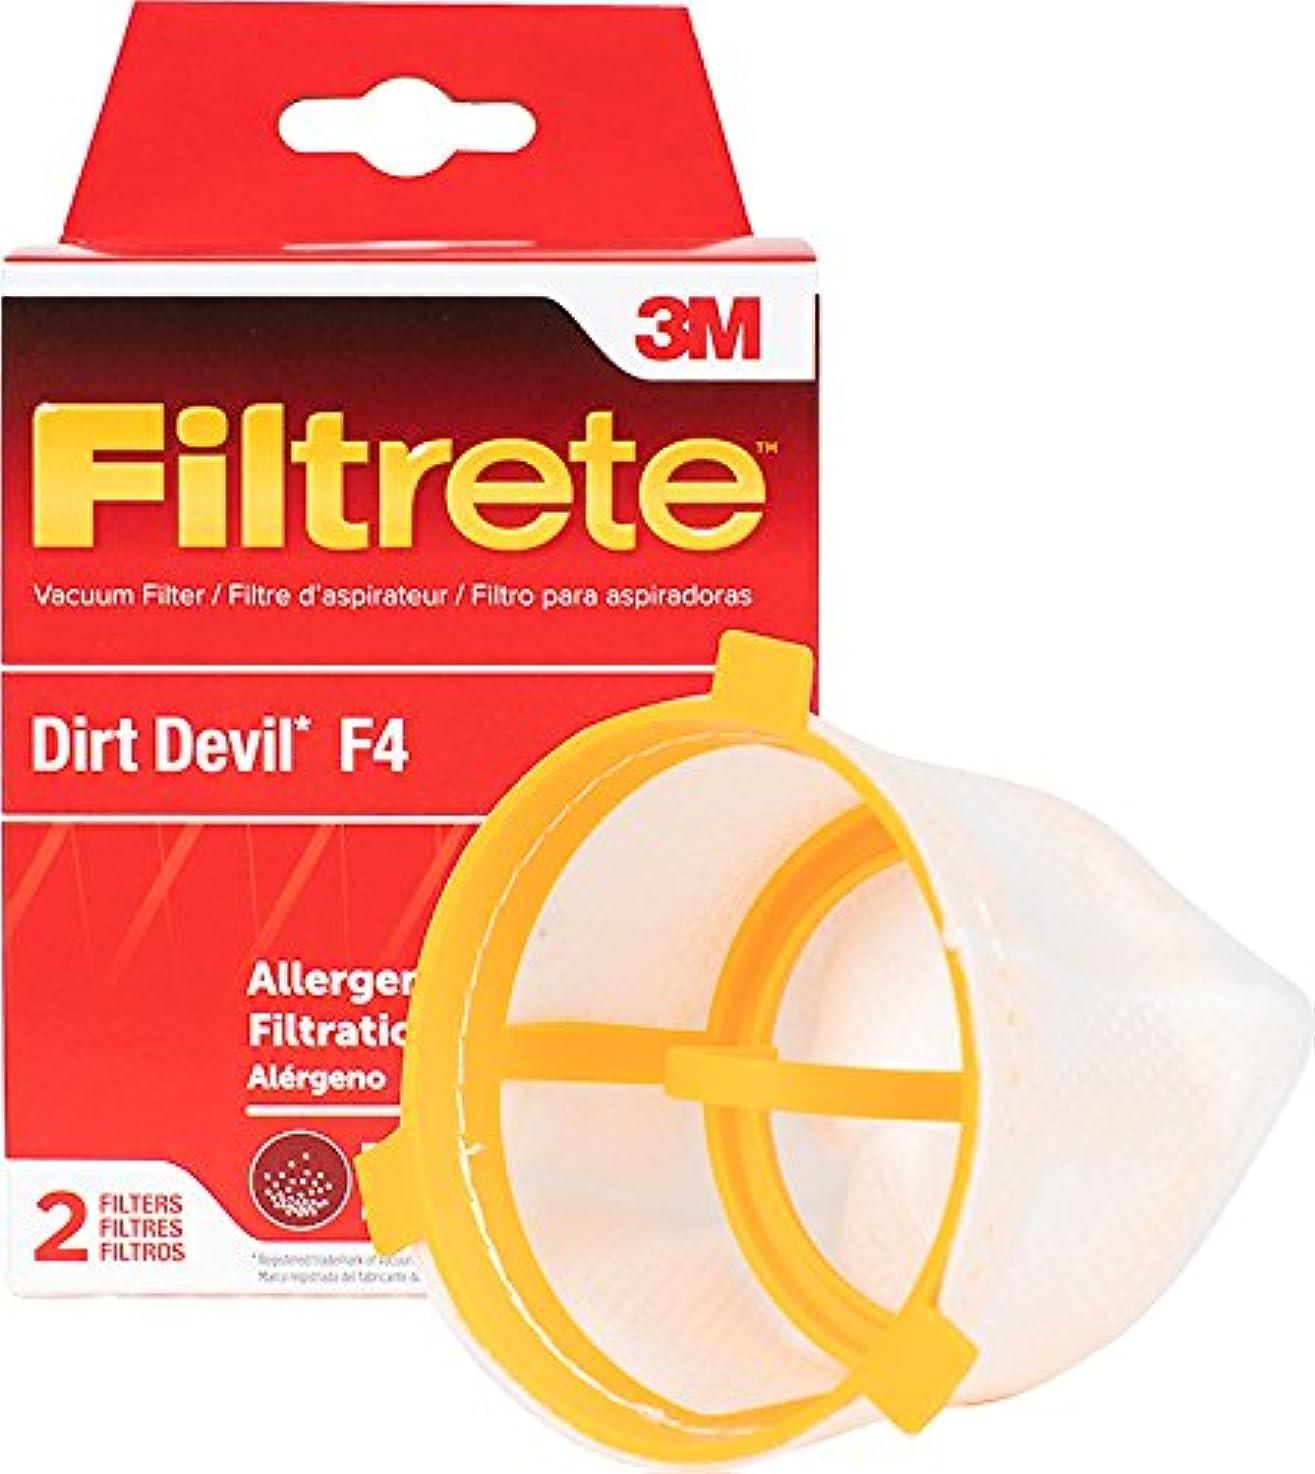 3M Filtrete Dirt Devil F4 Allergen Vacuum Filter xckadvmslltin0